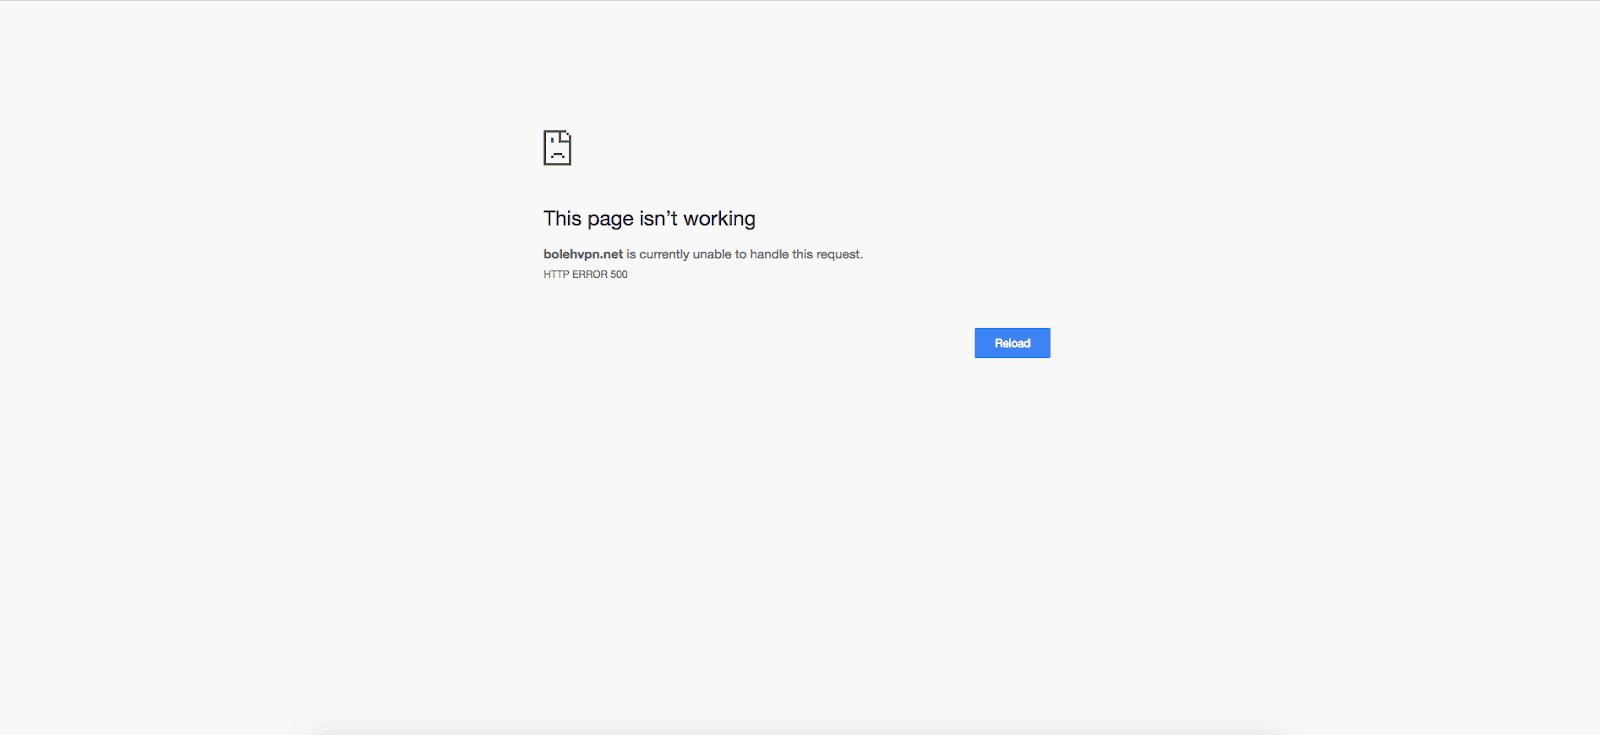 Forum not reachable